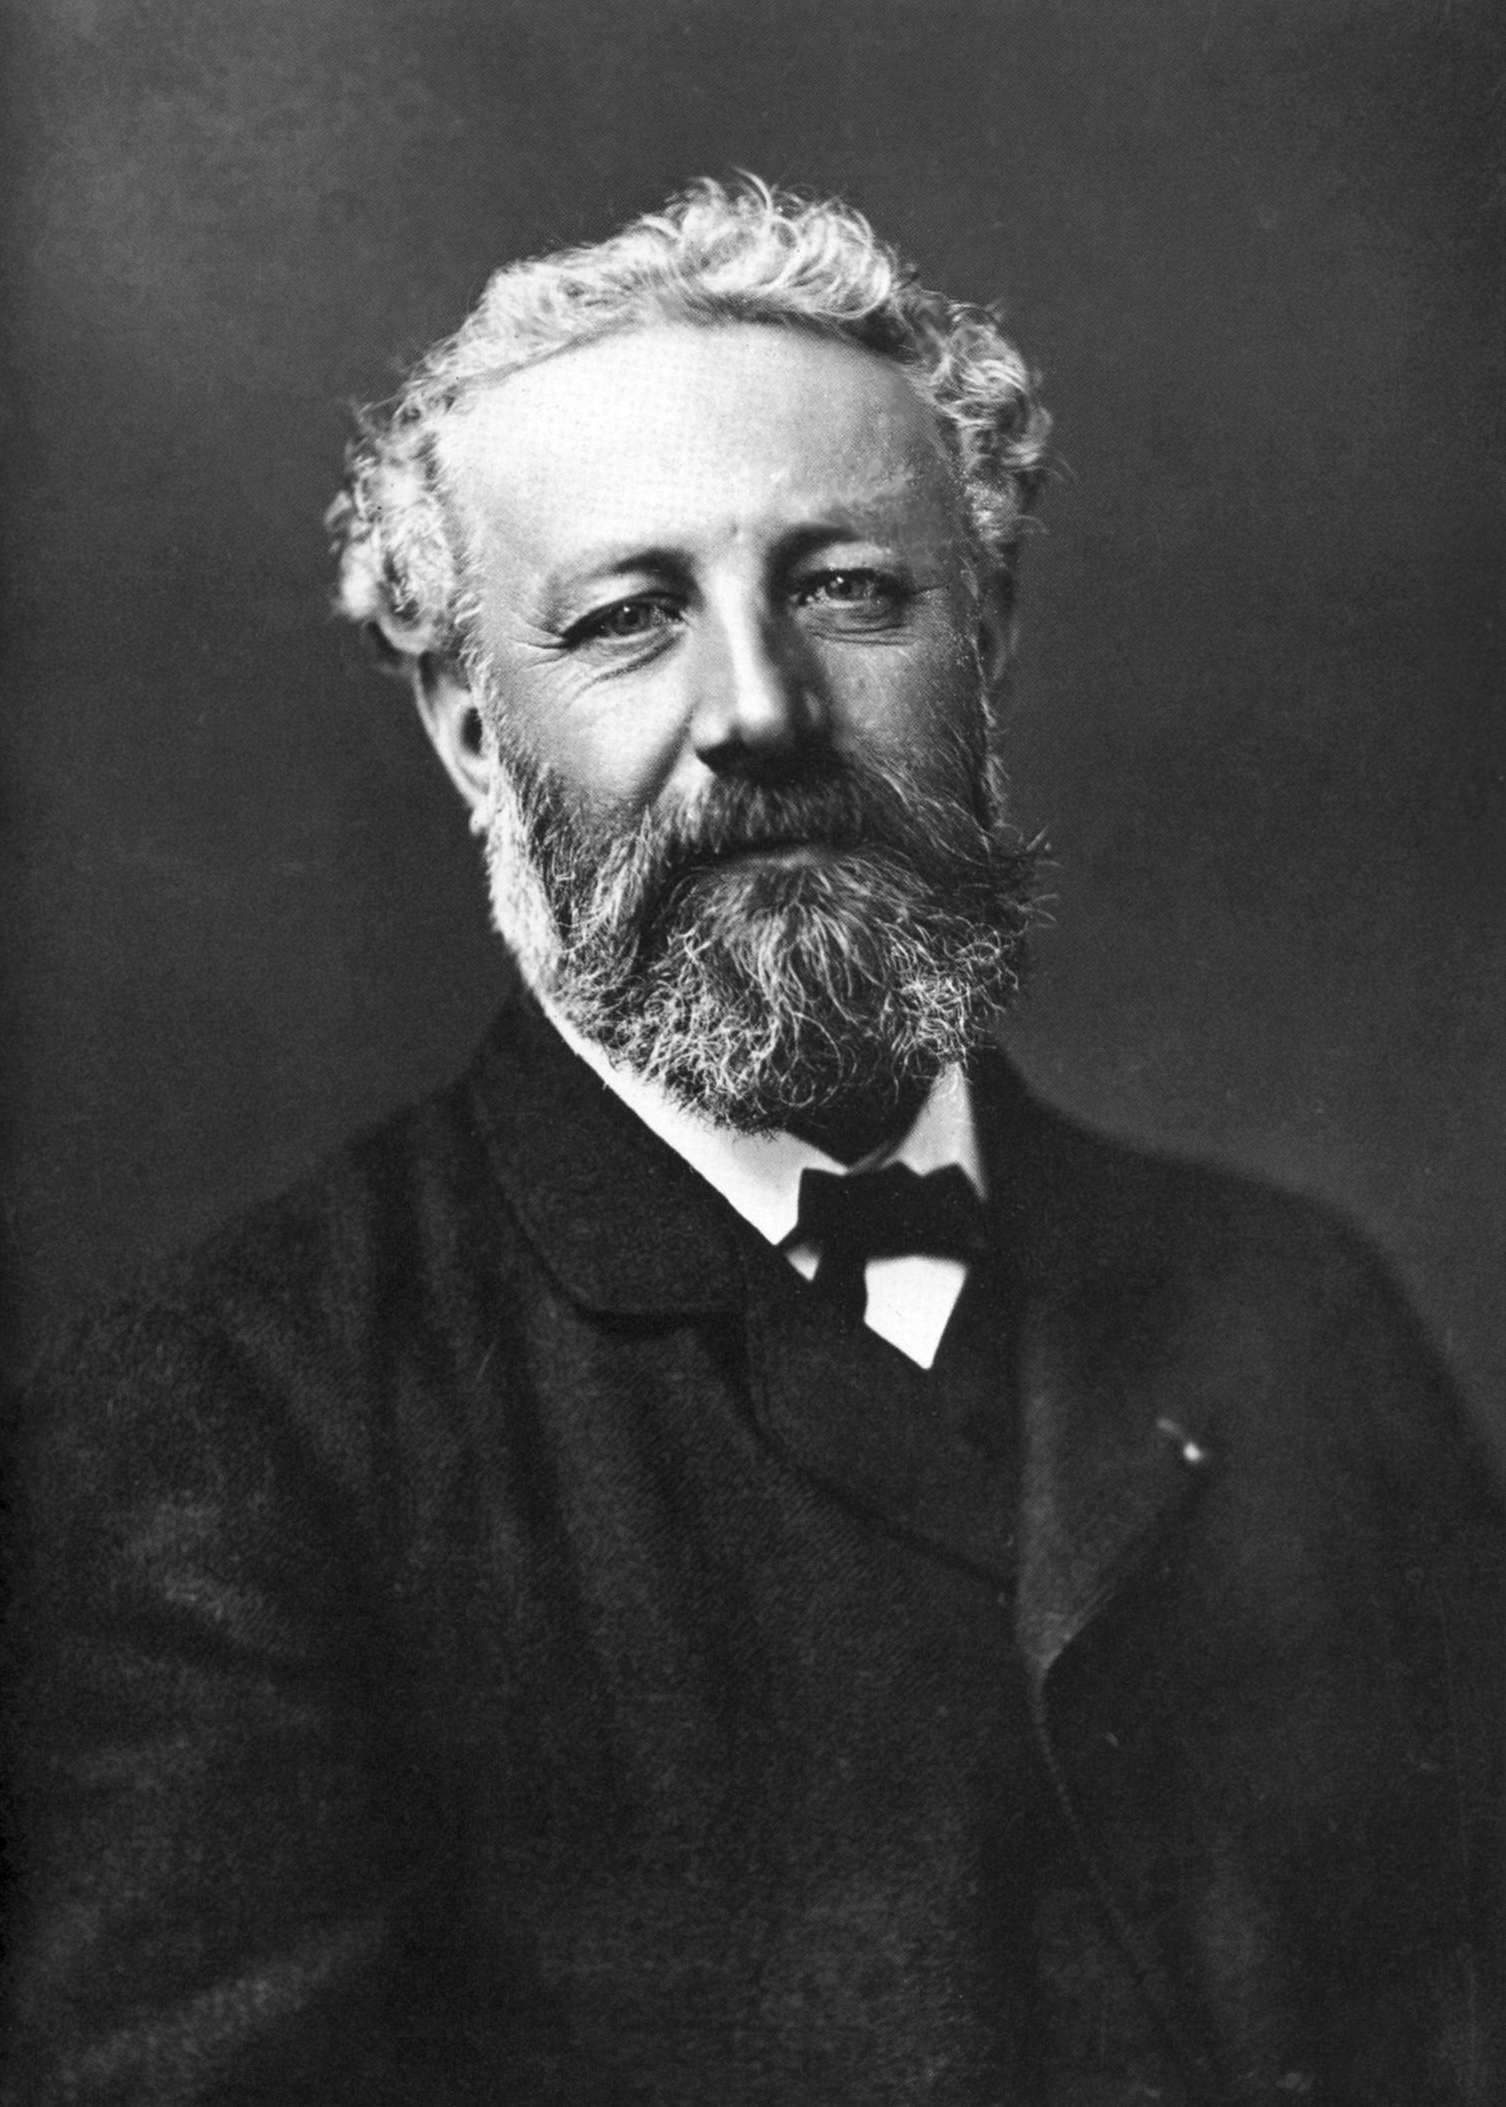 http://upload.wikimedia.org/wikipedia/commons/7/77/F%C3%A9lix_Nadar_1820-1910_portraits_Jules_Verne.jpg